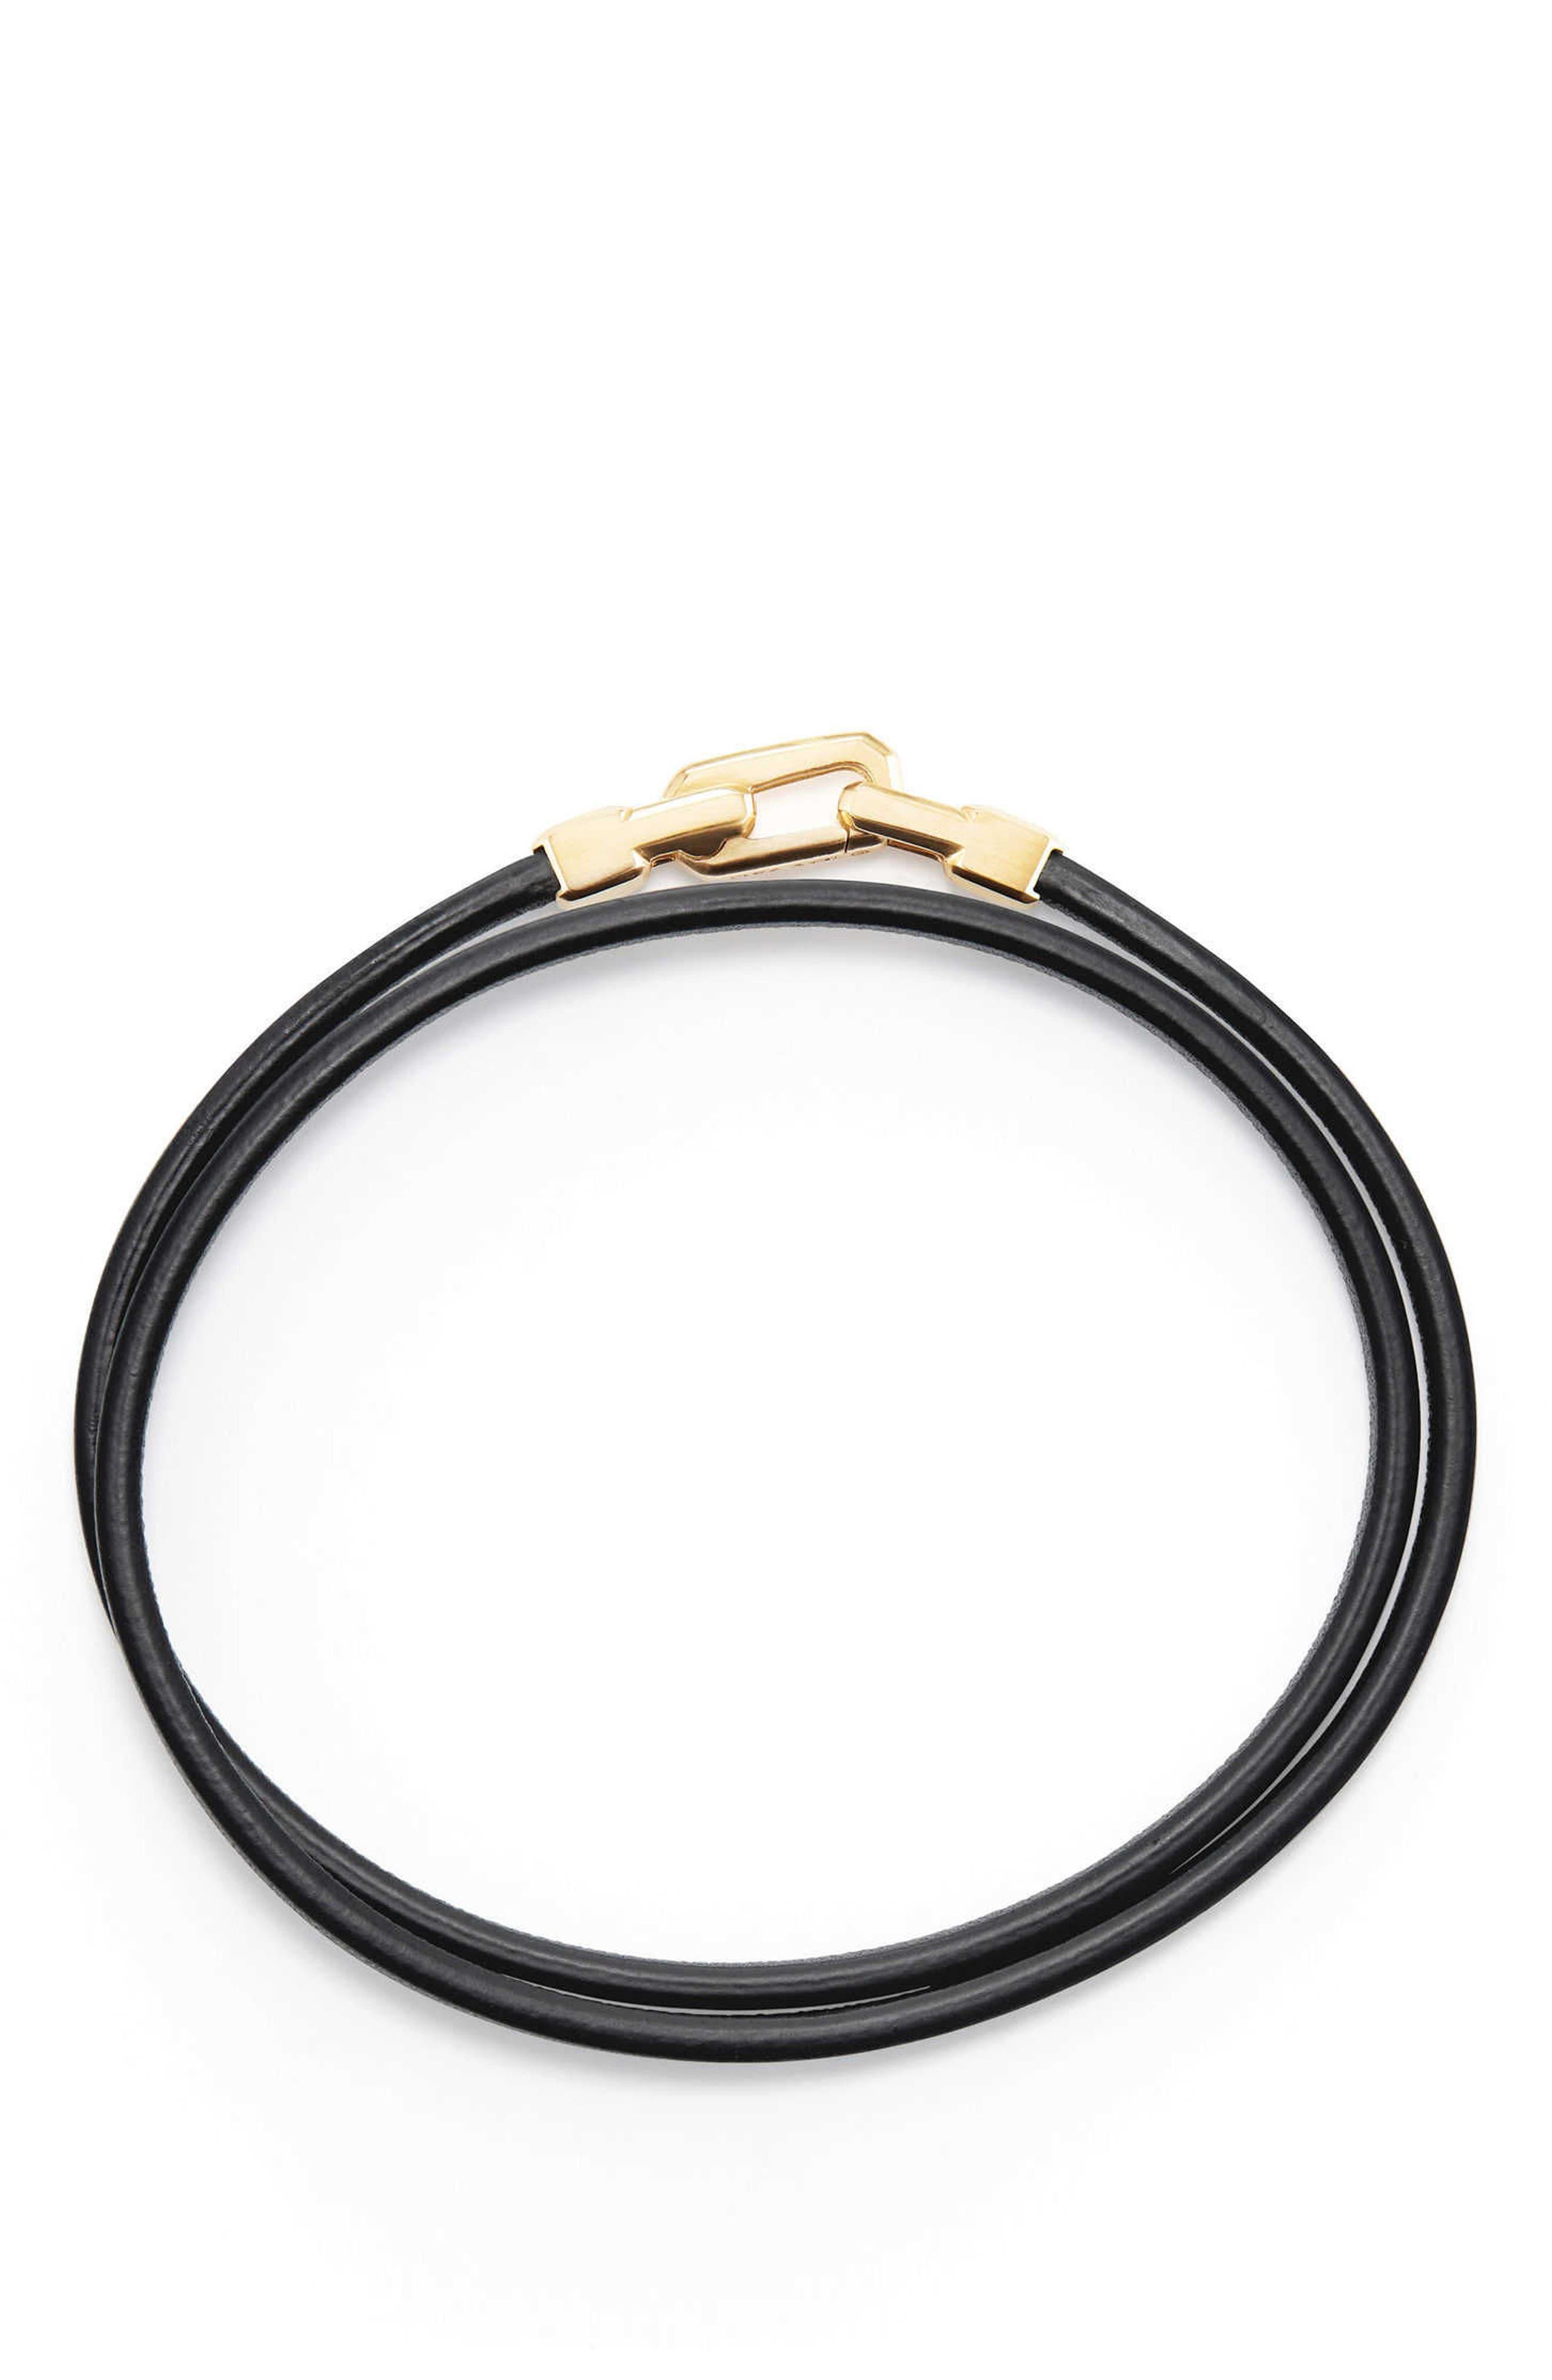 Streamline Double Wrap Leather Bracelet with 18K Gold,                             Alternate thumbnail 2, color,                             Gold